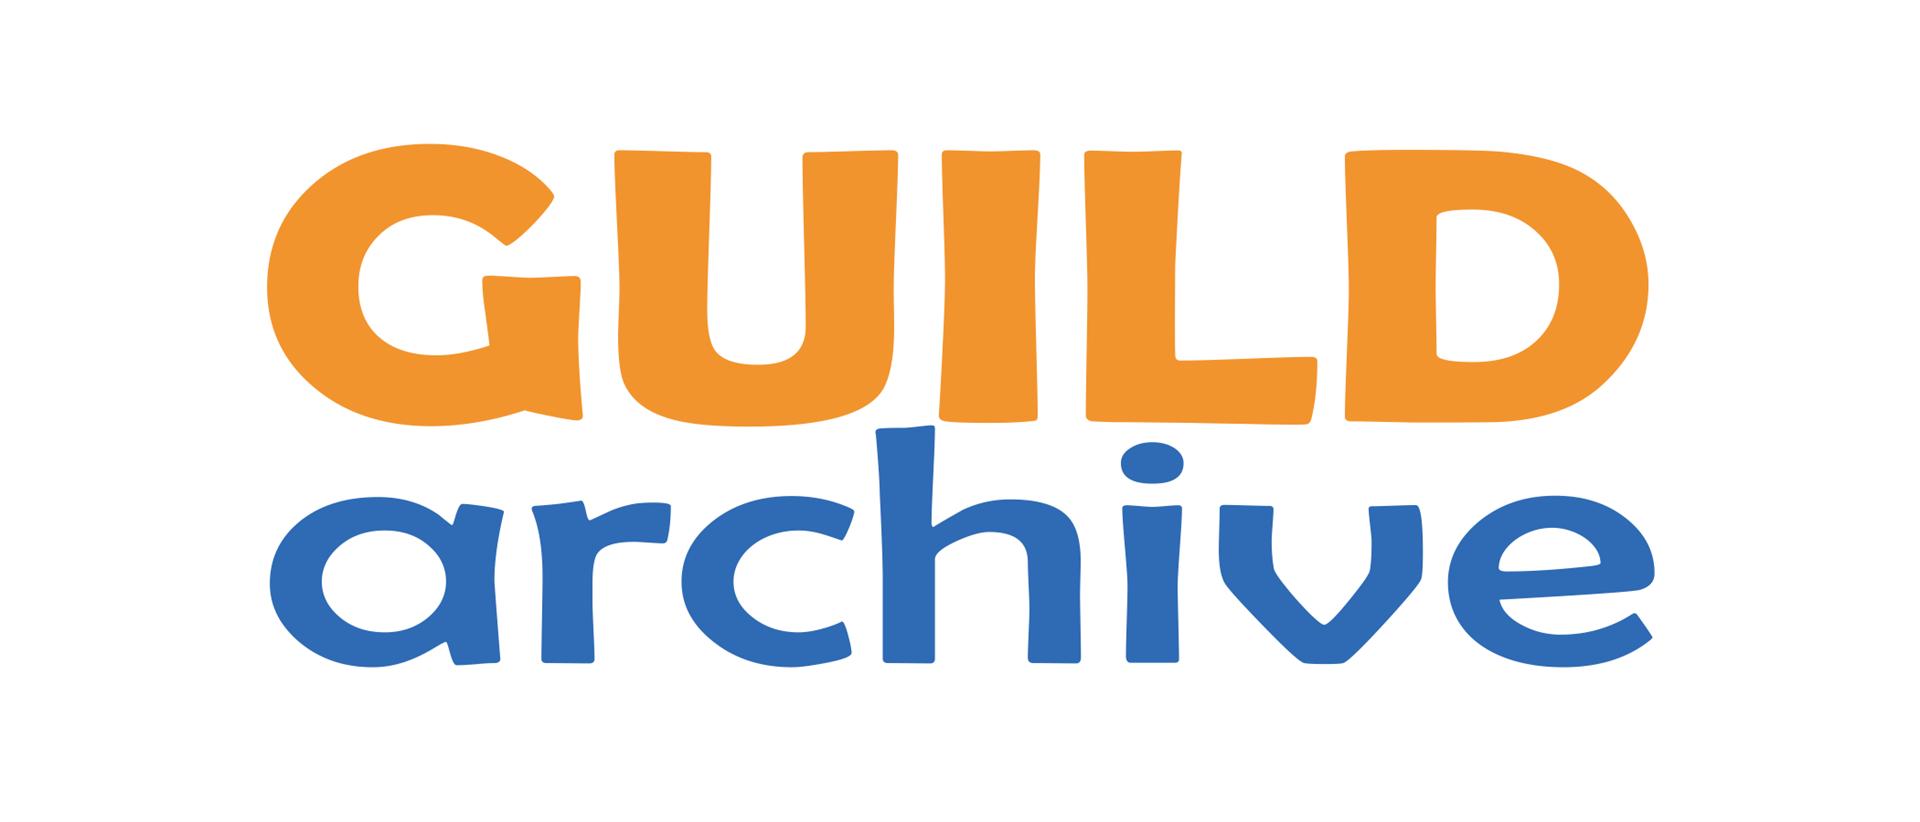 The Pet Professional Guild - Equine Archives